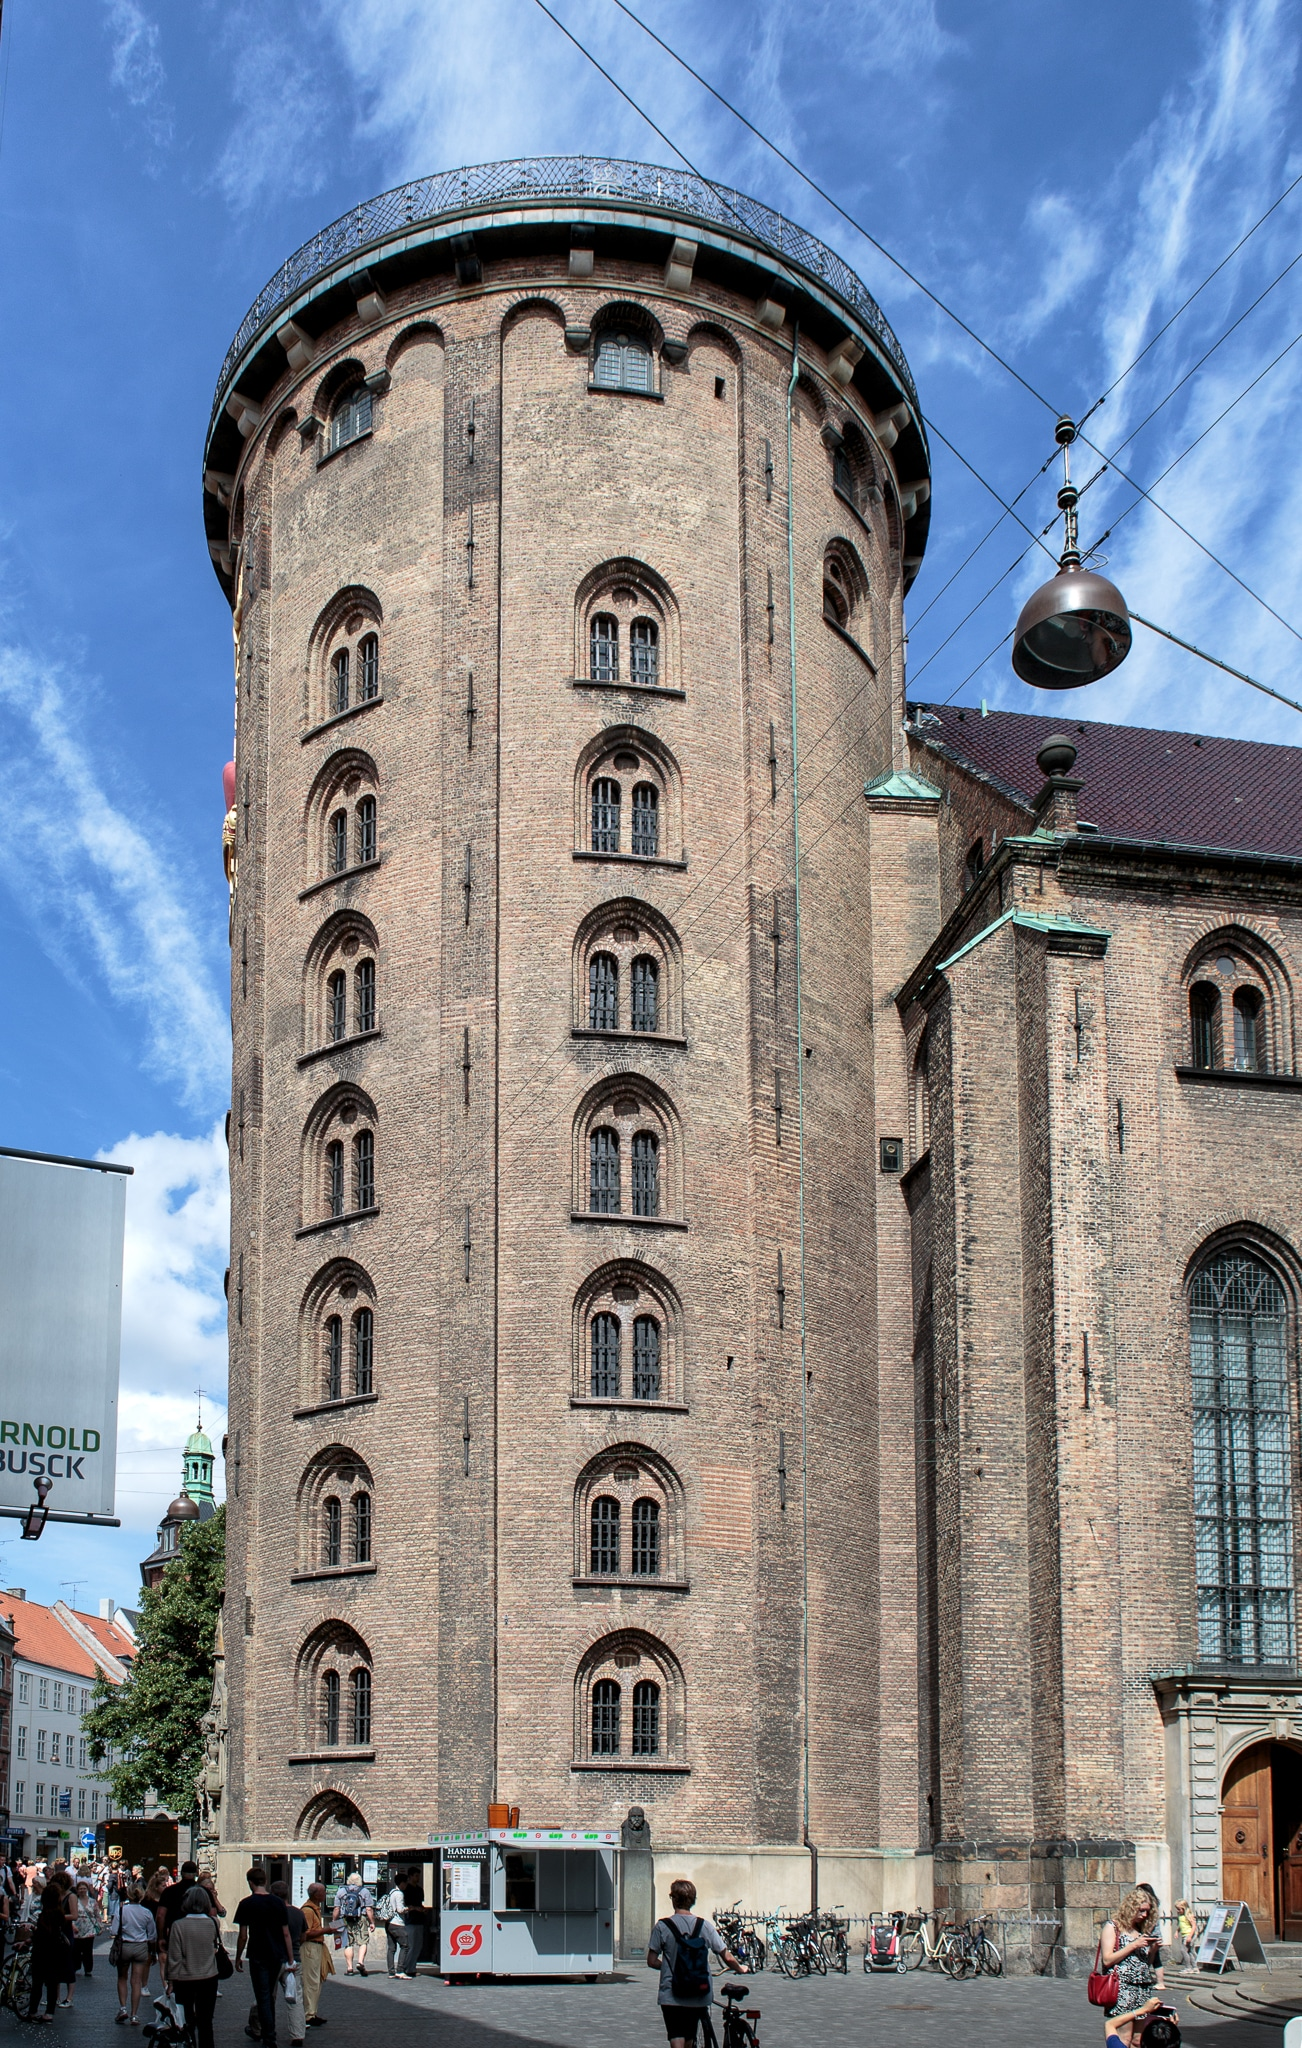 Turnul Rotund din oraşul Copenhaga